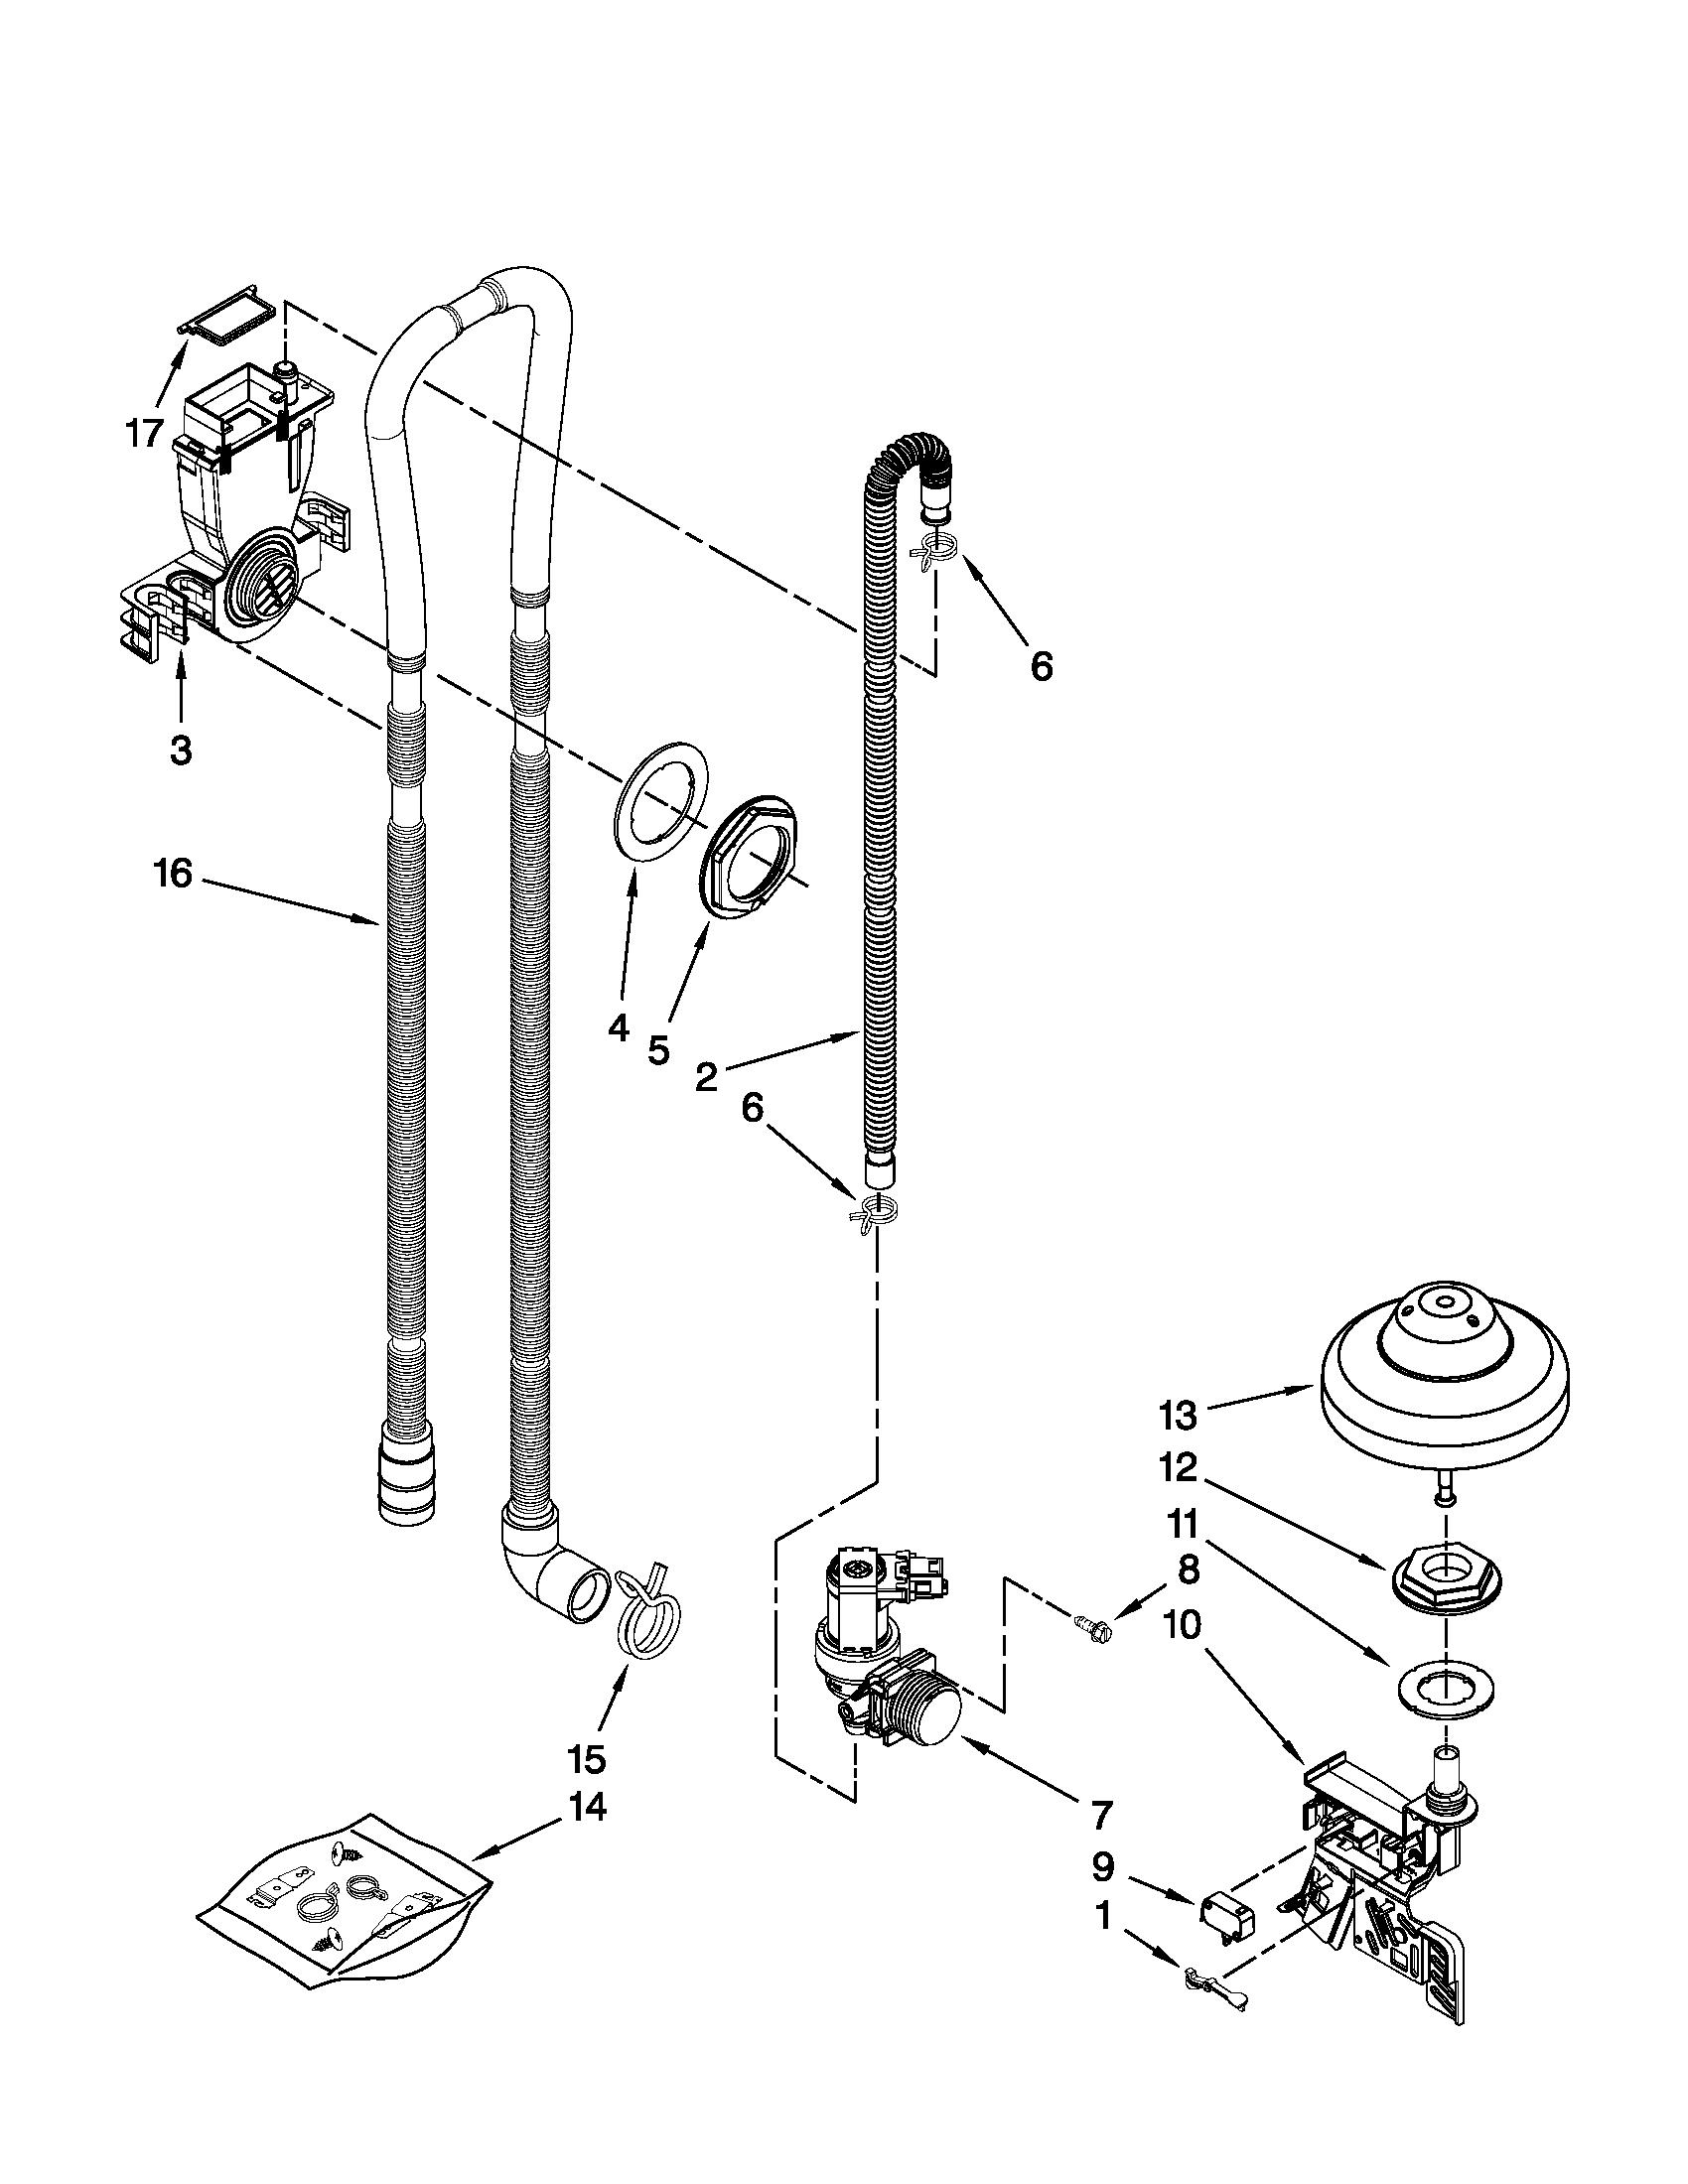 Kitchenaid model KUDC10IXSS7 dishwasher genuine parts